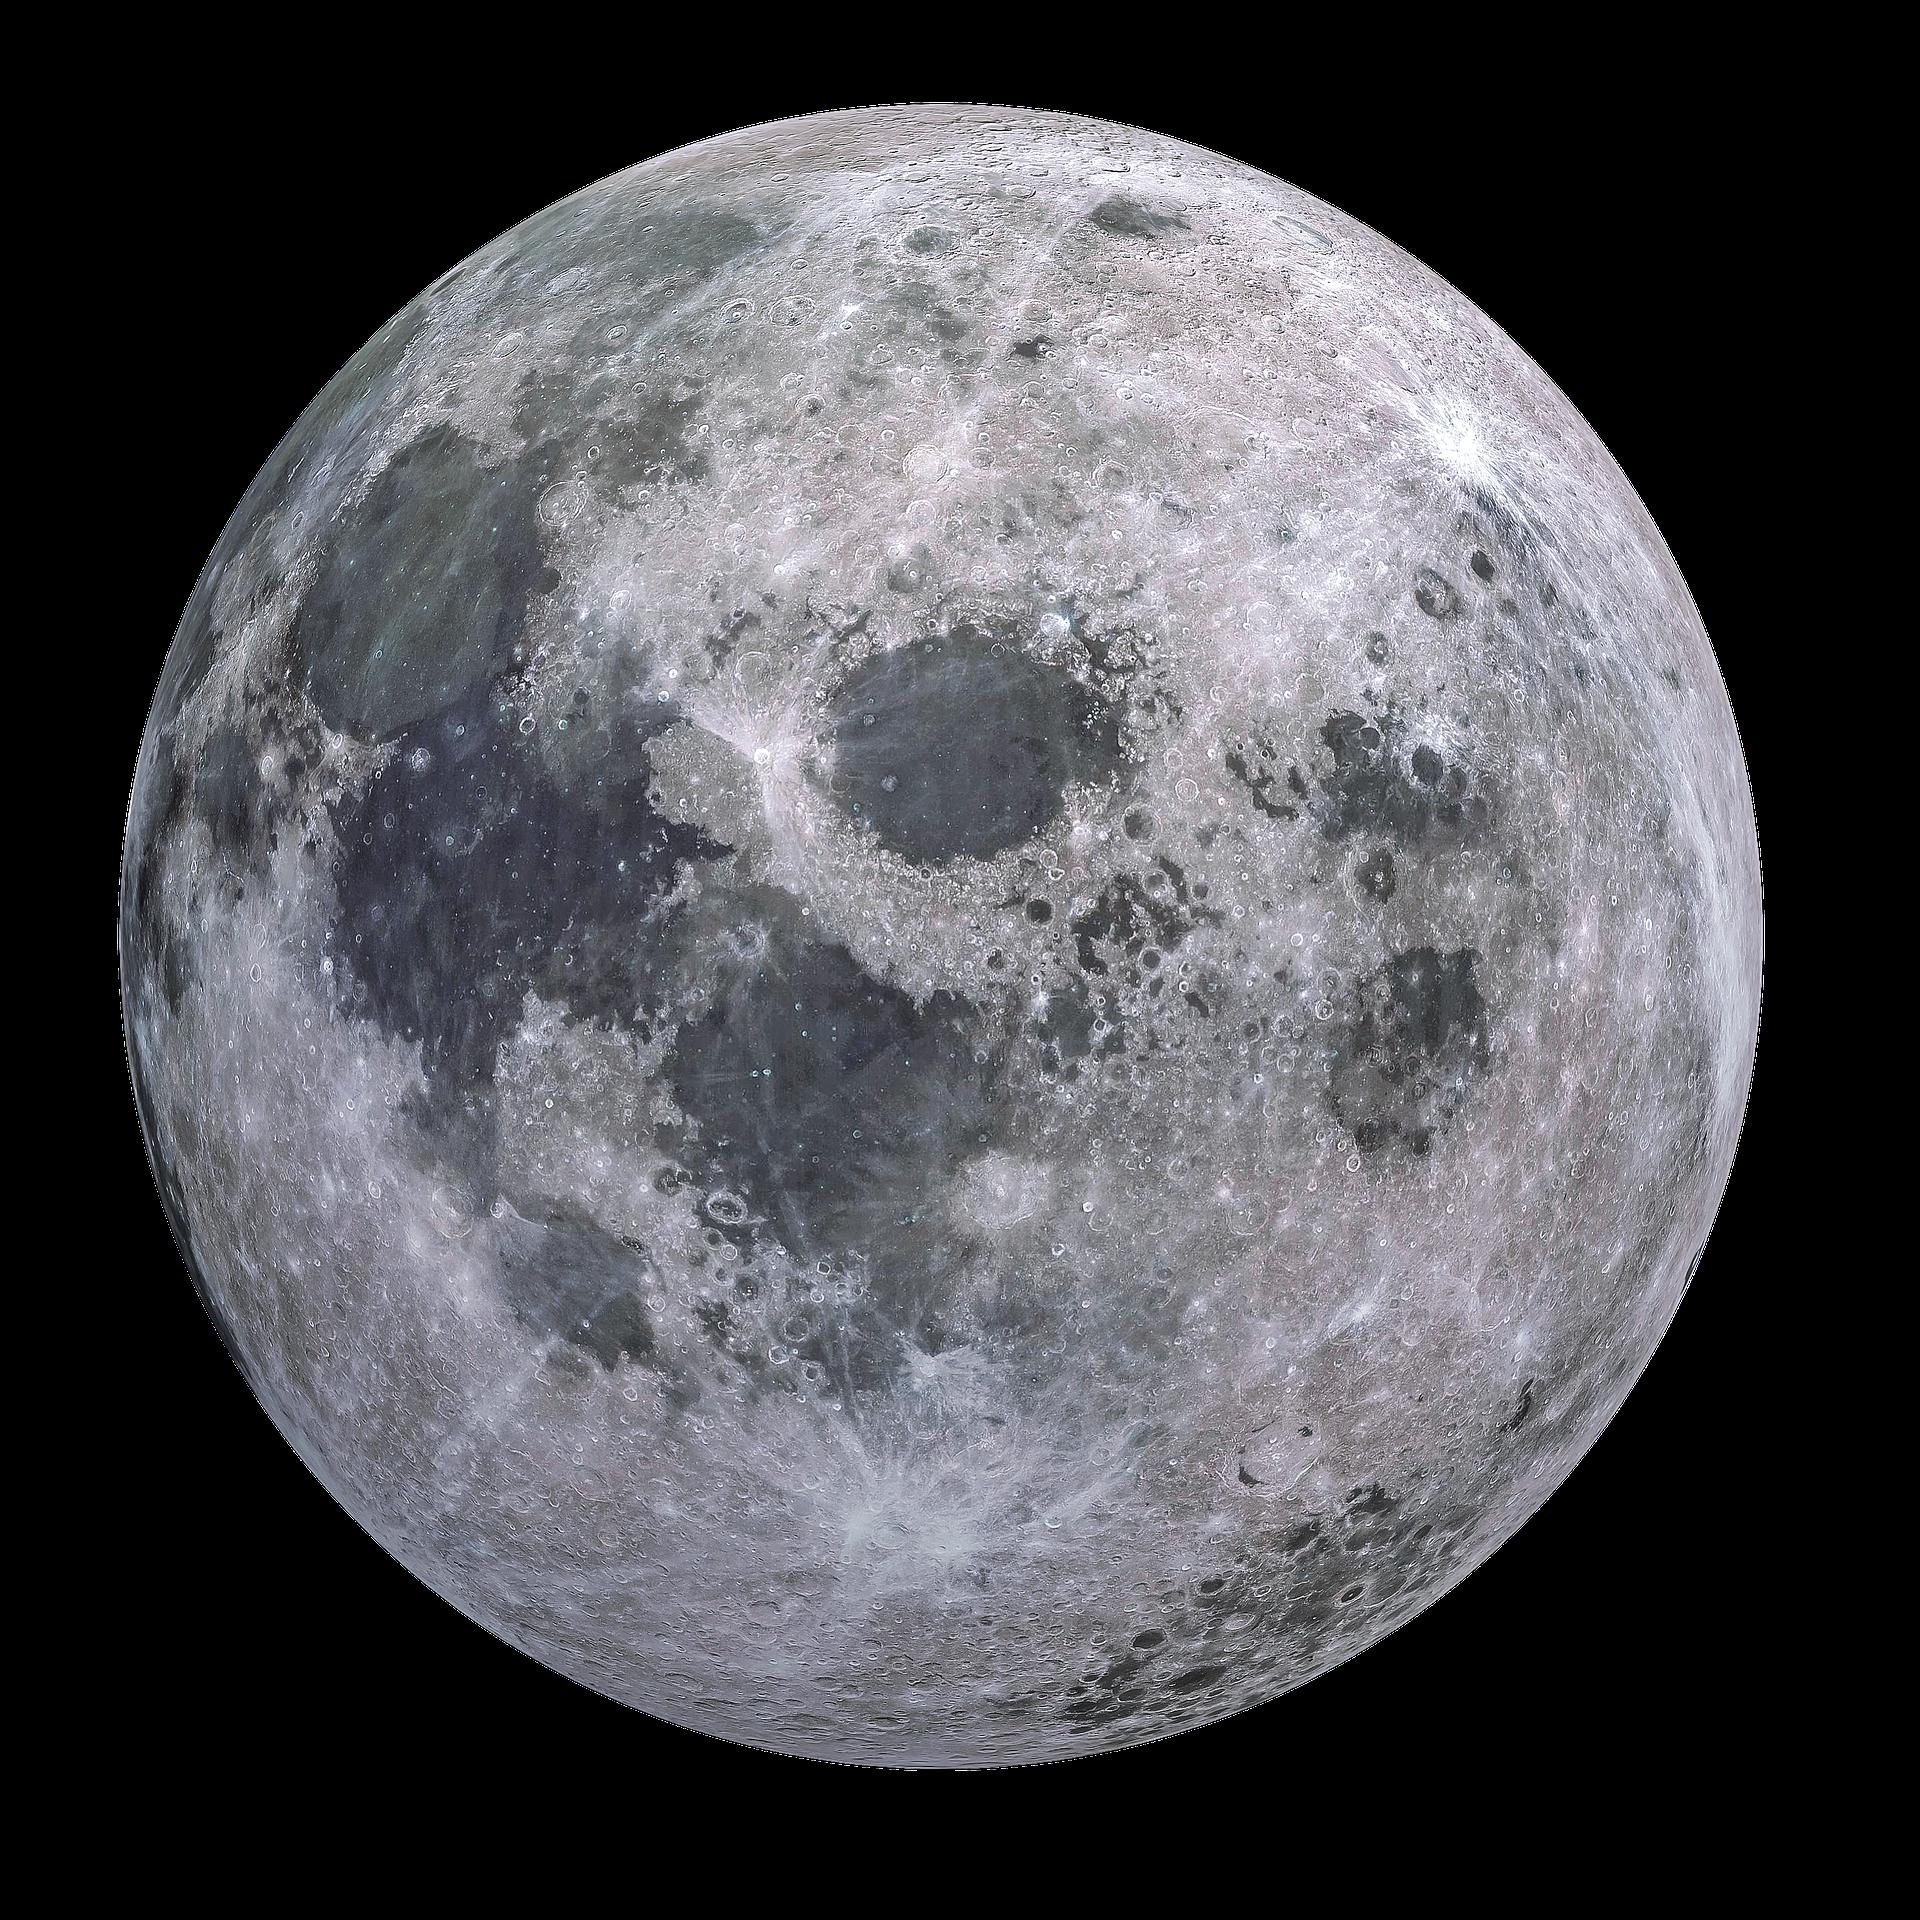 moon-1303512_1920TA3eReX5eyL75